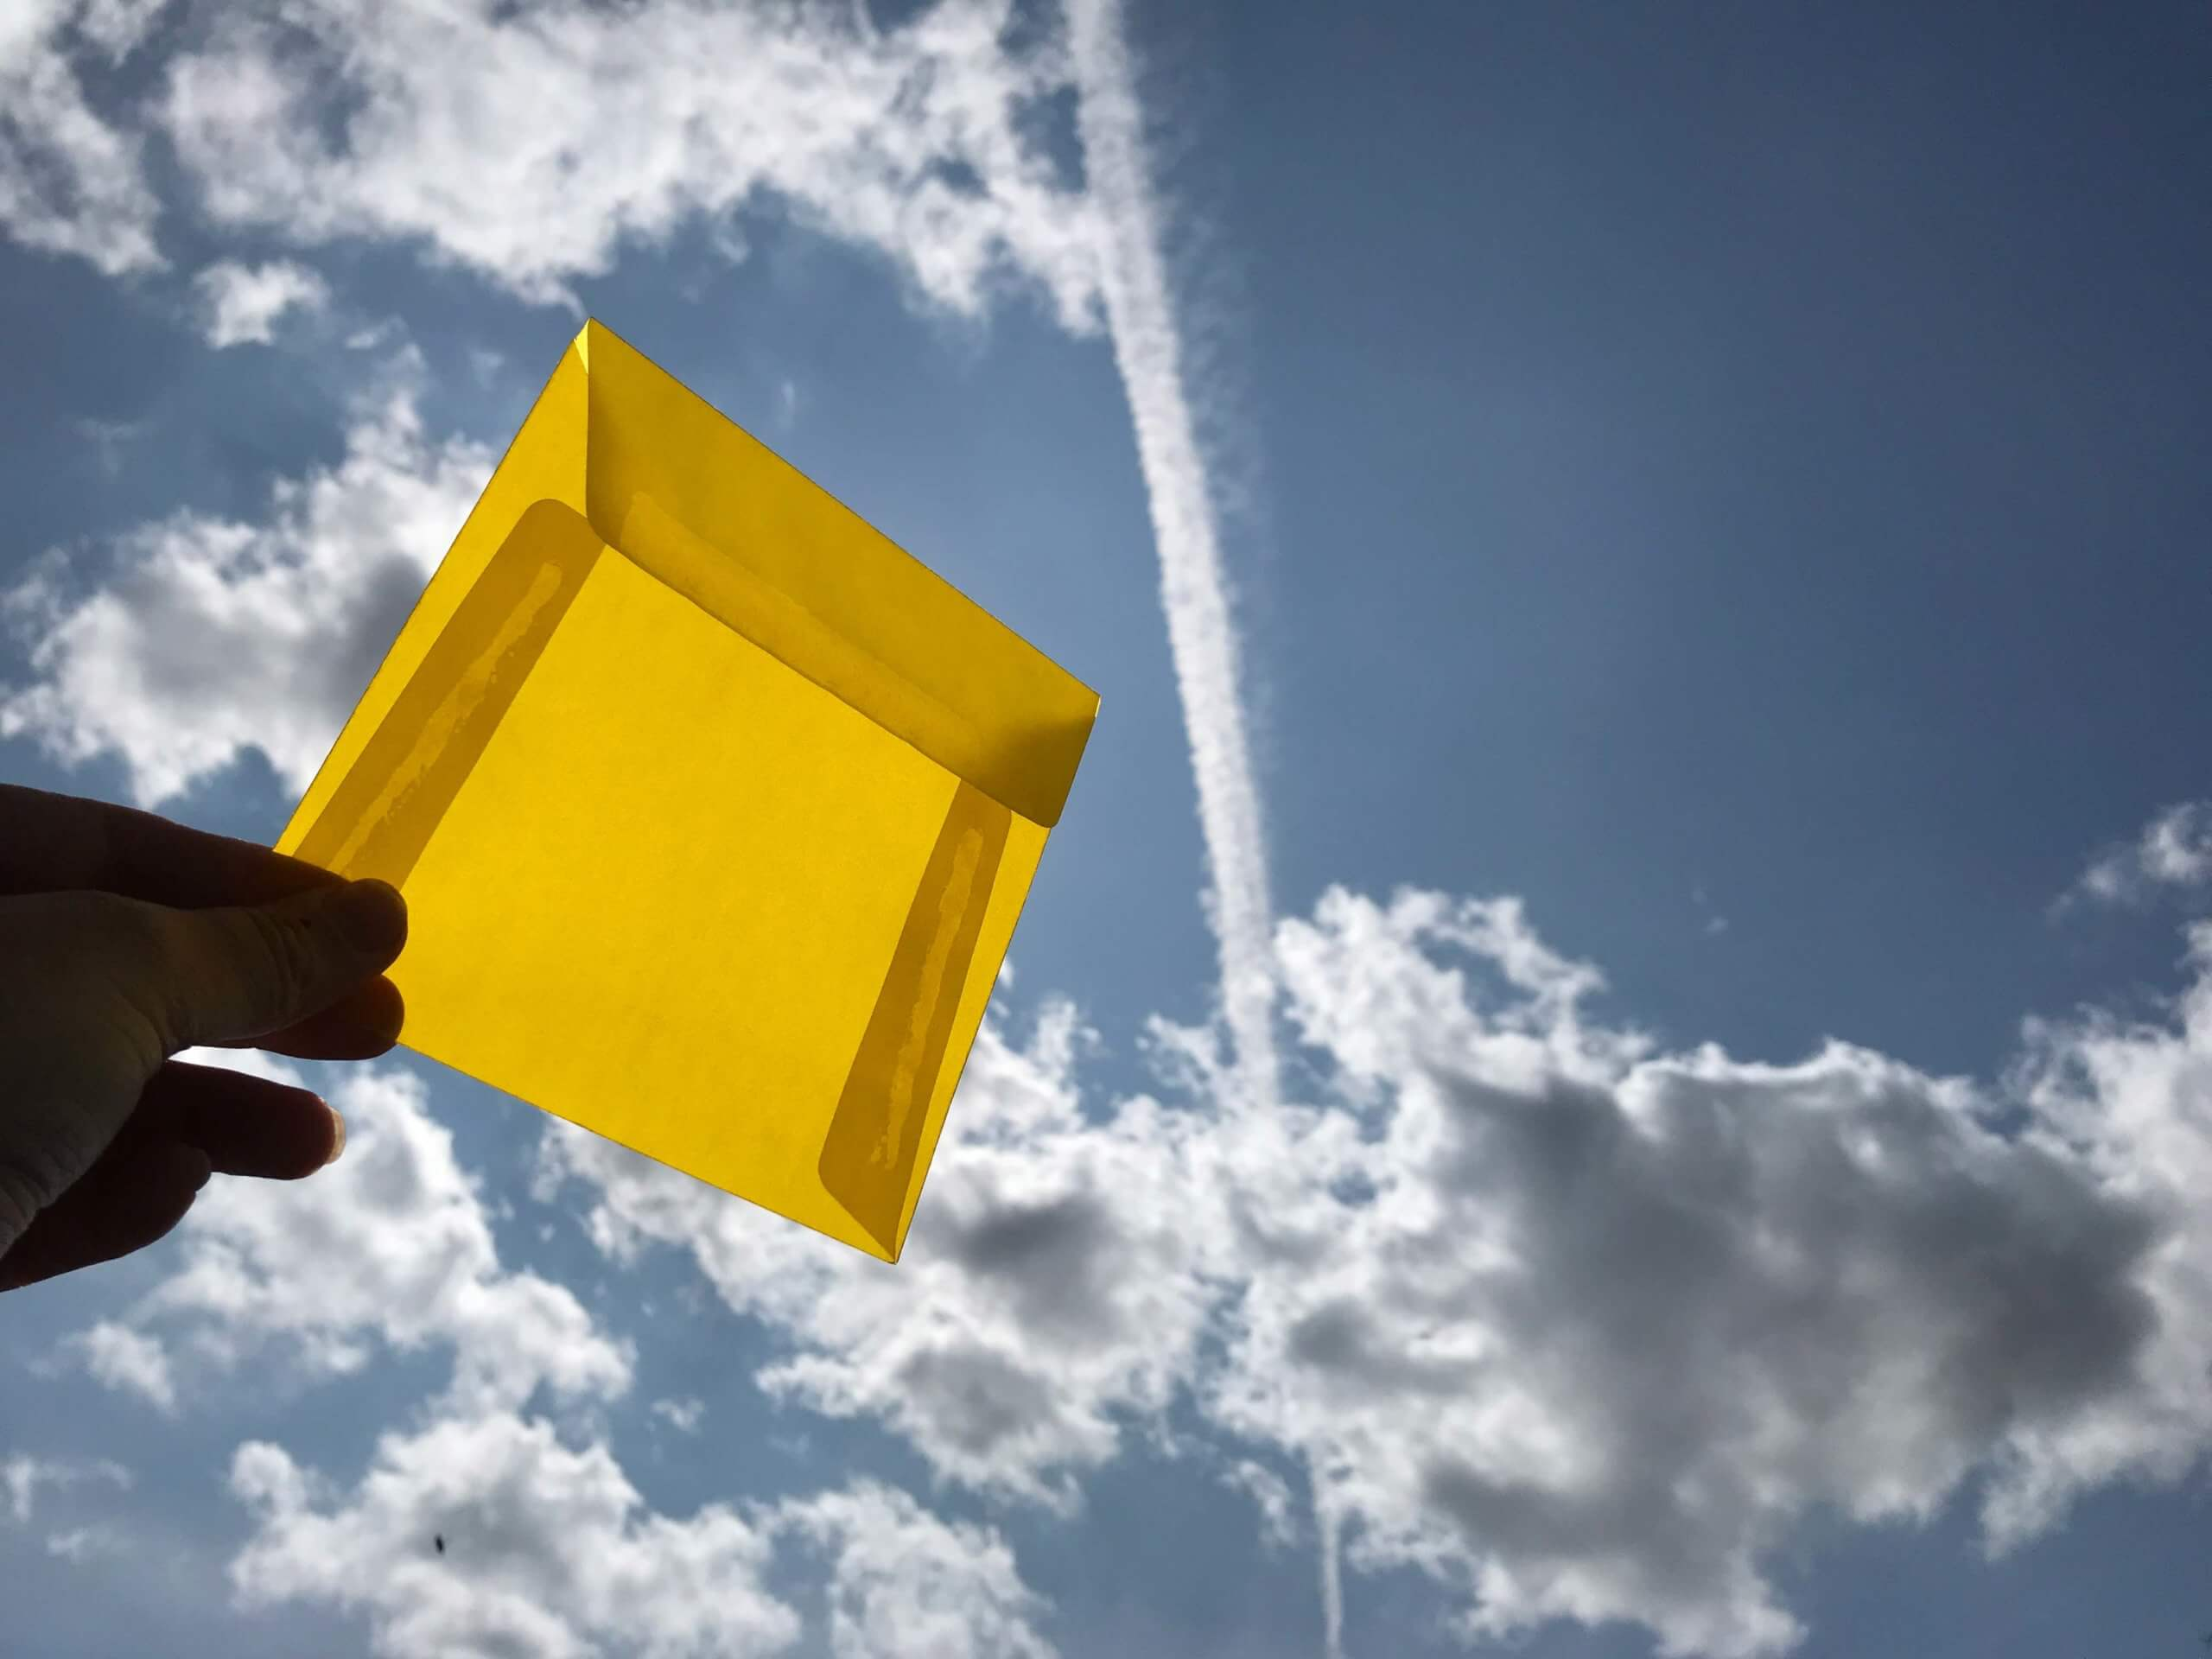 Wolkenbode TurnLab Stil de Tijd